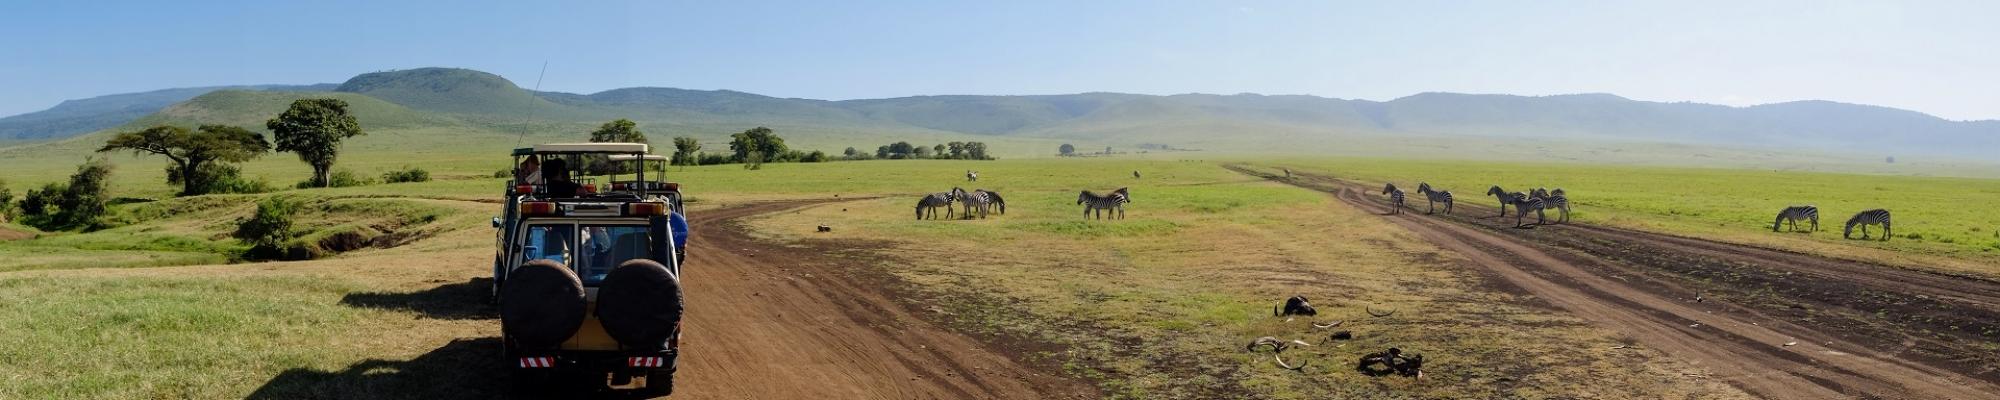 Safari Tanzanie en famille